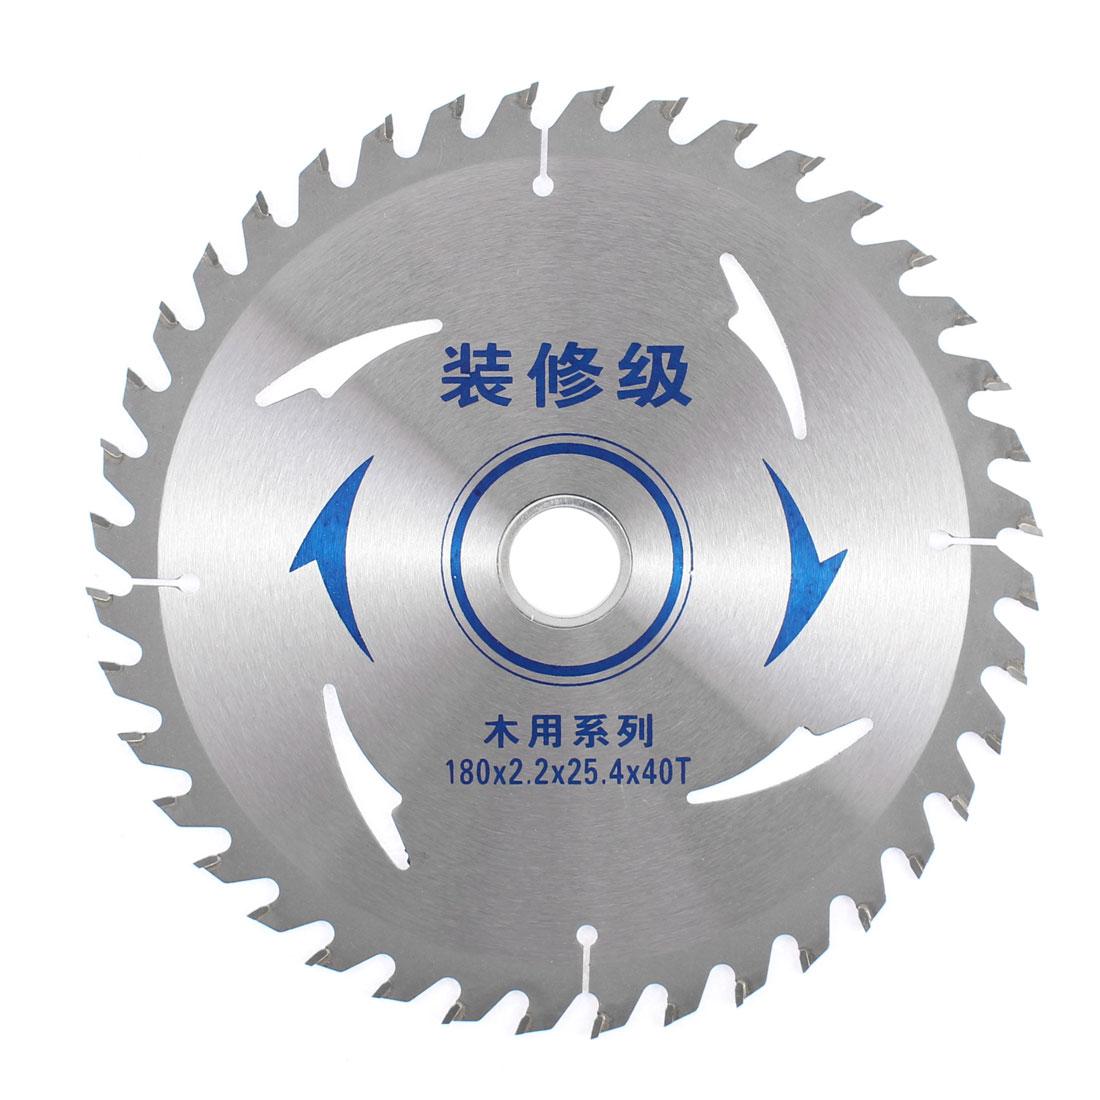 180mmx25.4mmx2.2mm 40T Circular Milling Slitting Slotting Saw Mill Cutter